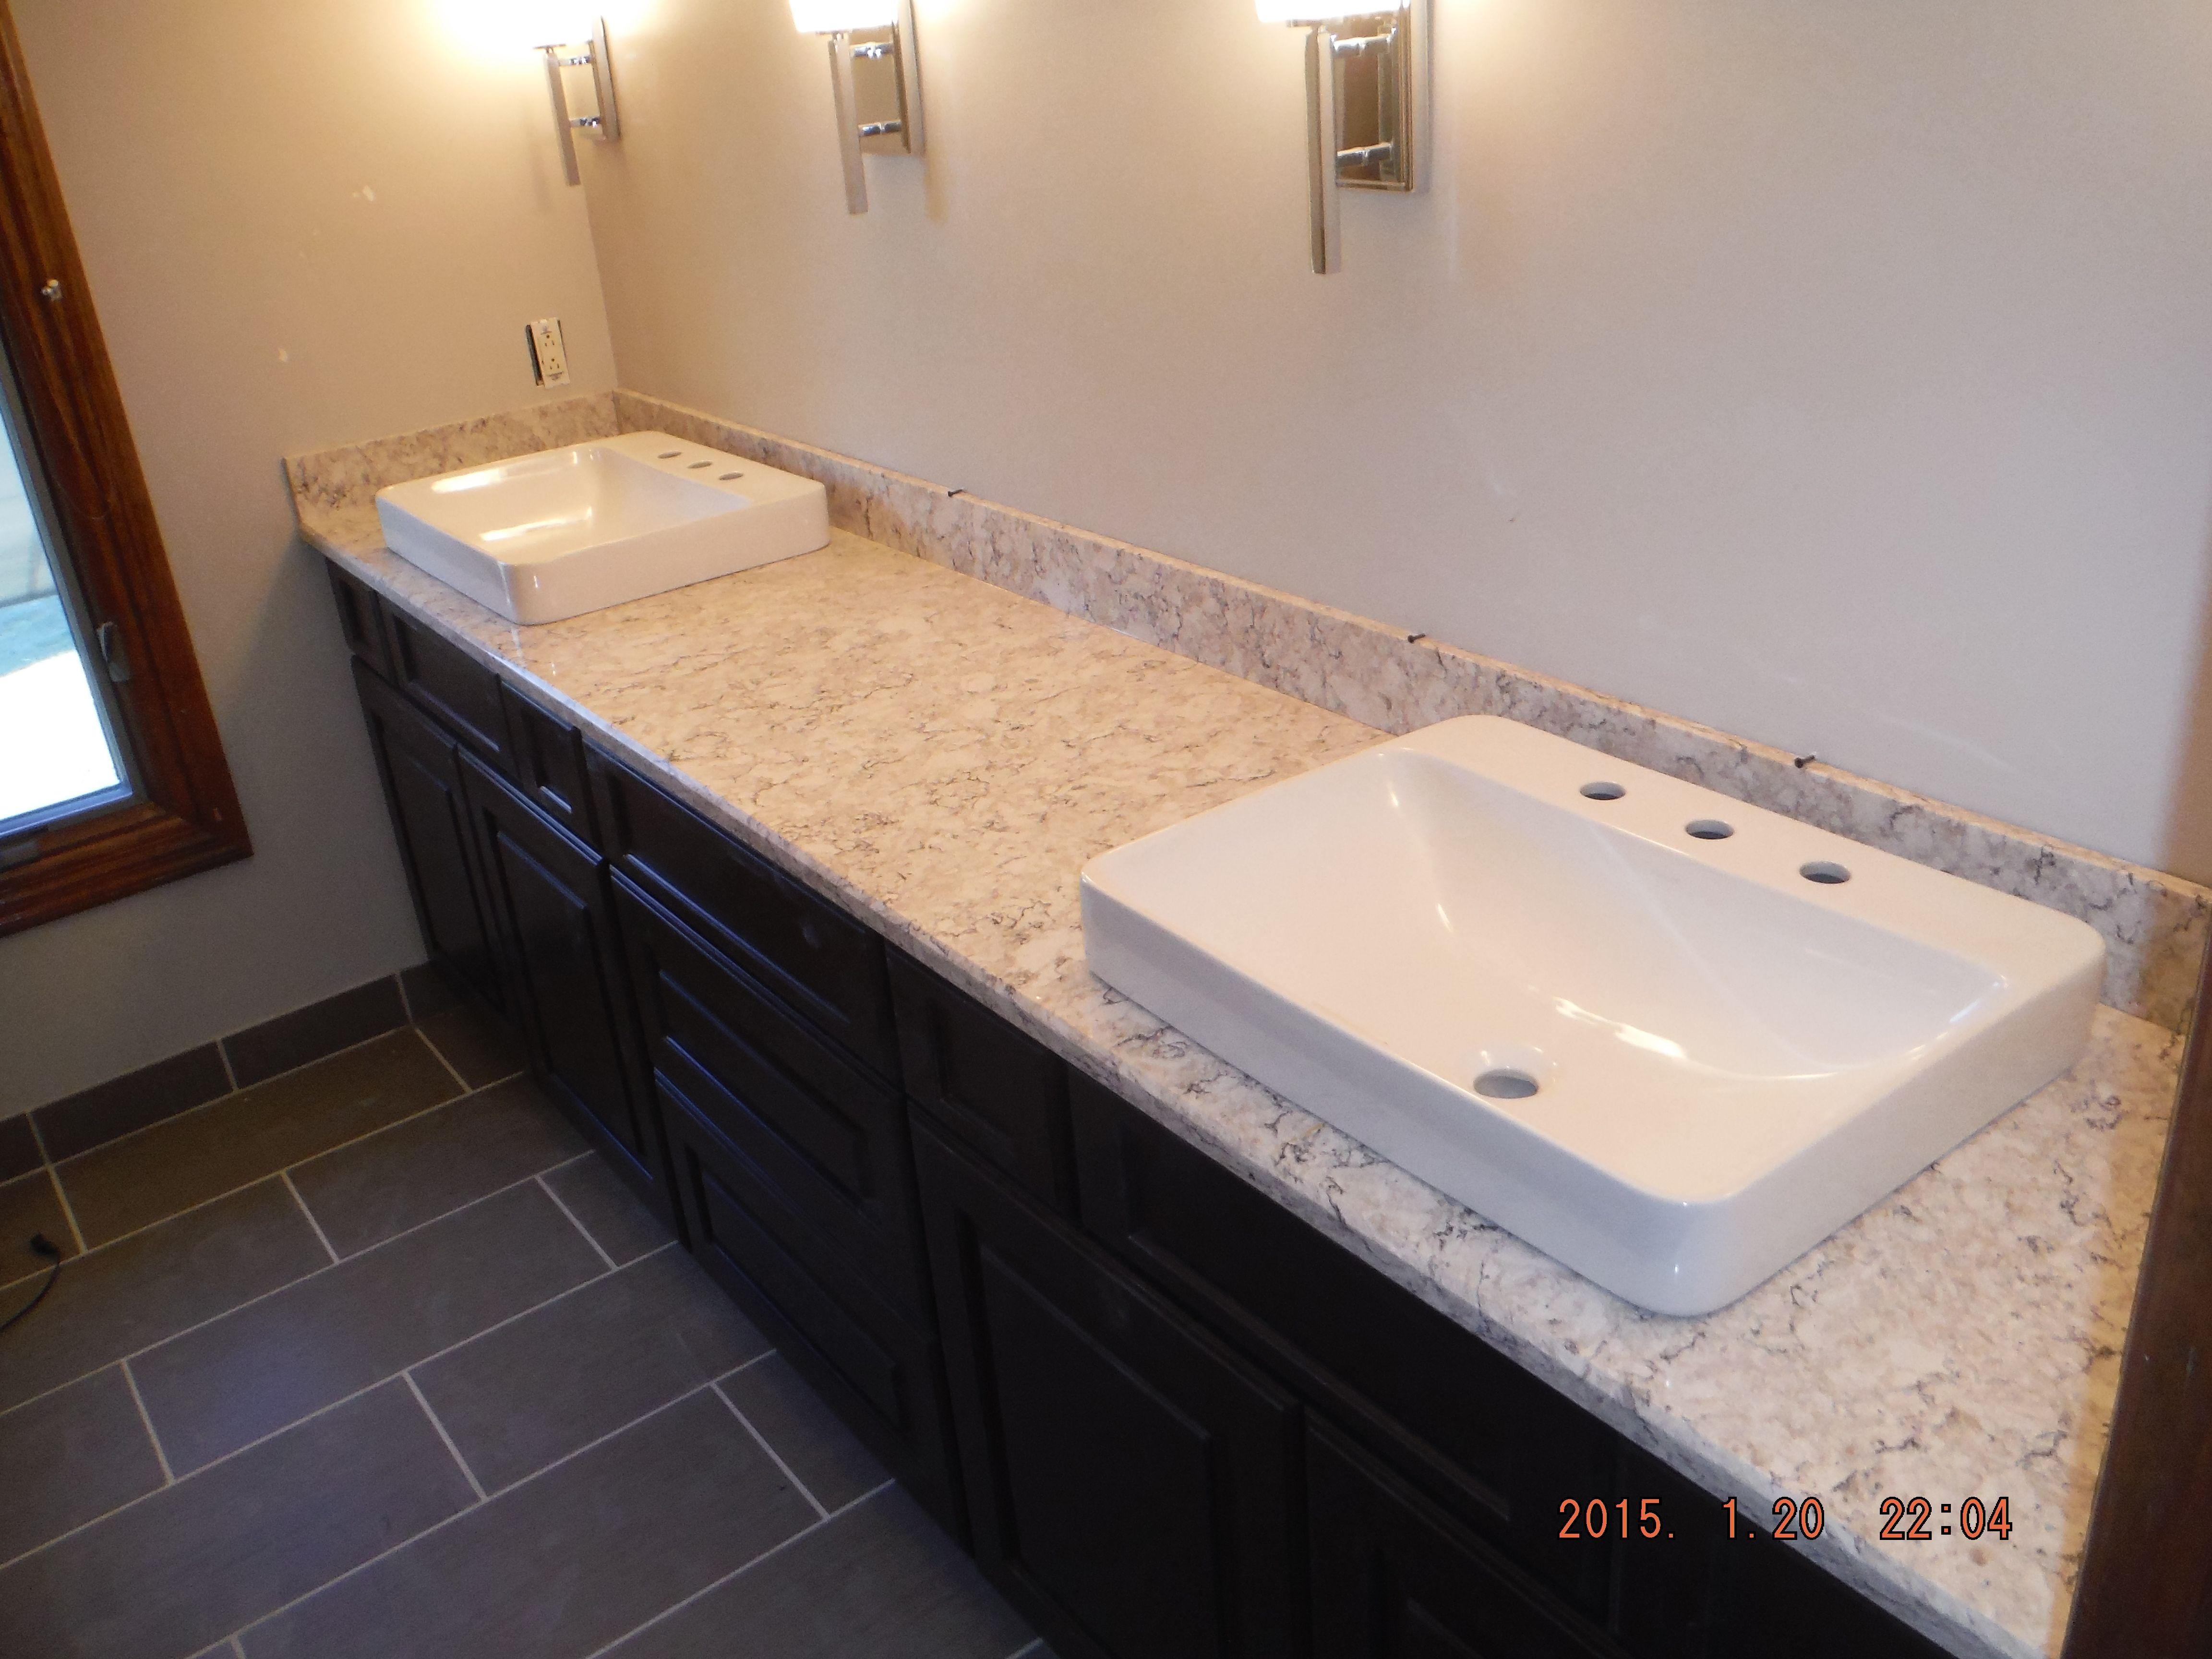 LG Viatera Aria Quartz Kitchen Install For The Foster Family. Knoxvilleu0027s  Stone Interiors. Showroom